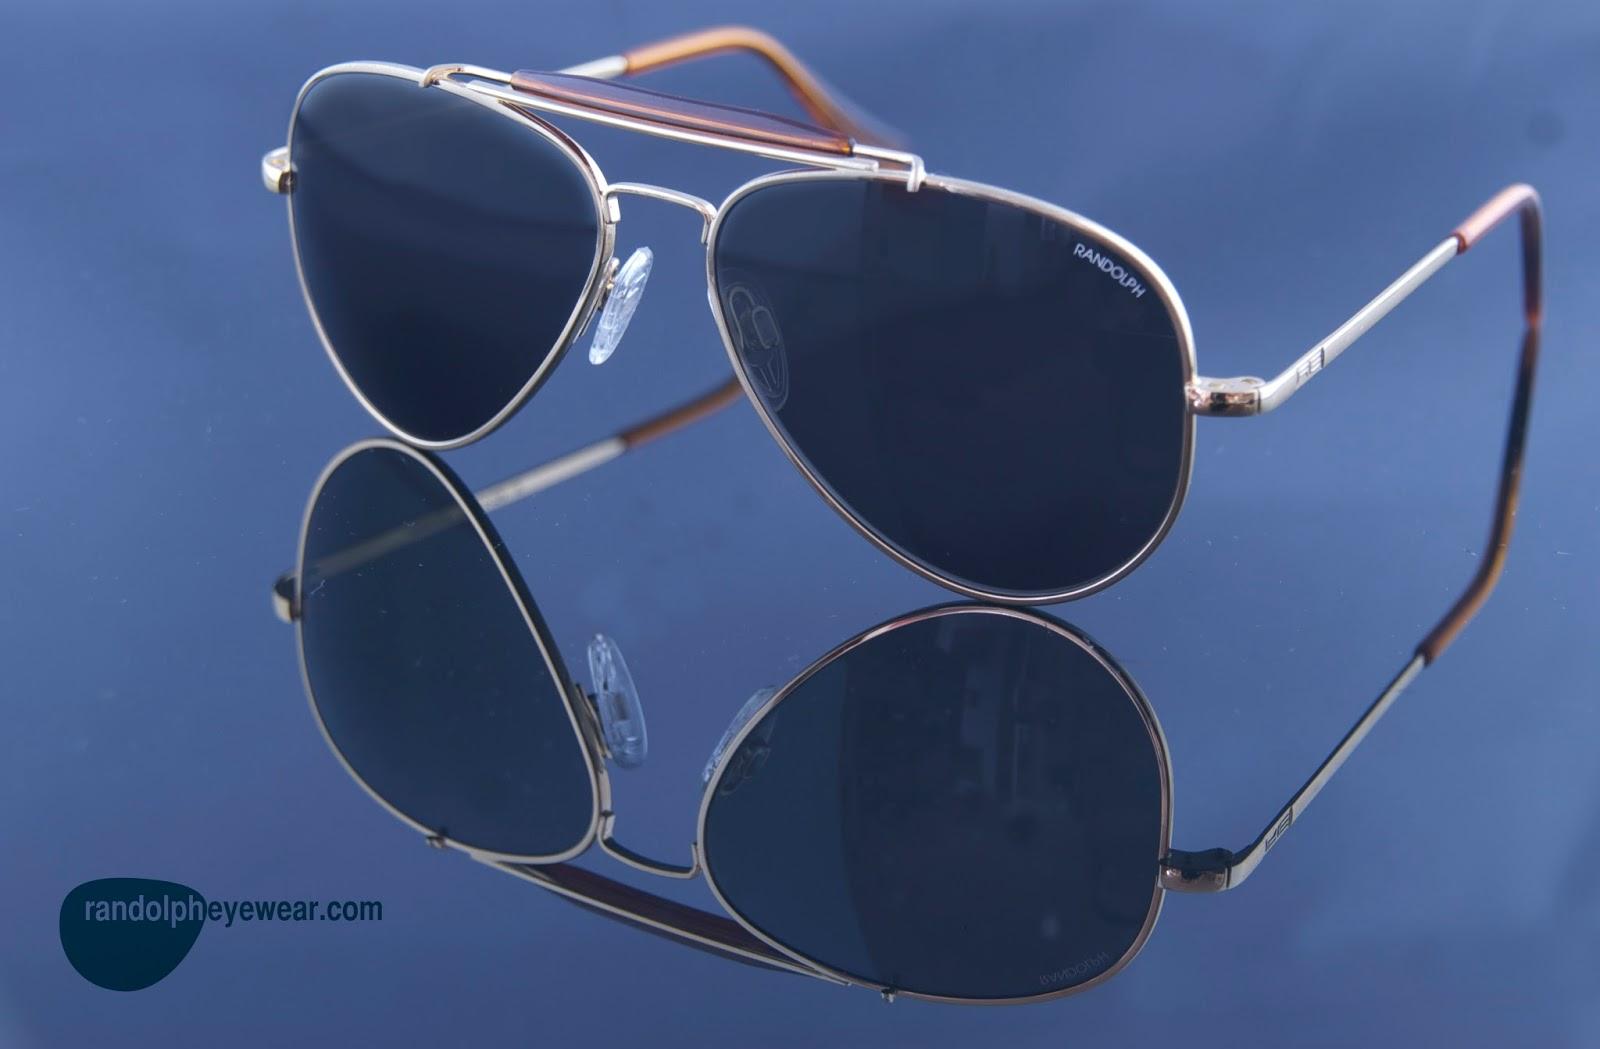 0eb84710e54d Randolph Eyewear makes the best quality sunglasses around. They make the  classic aviator look